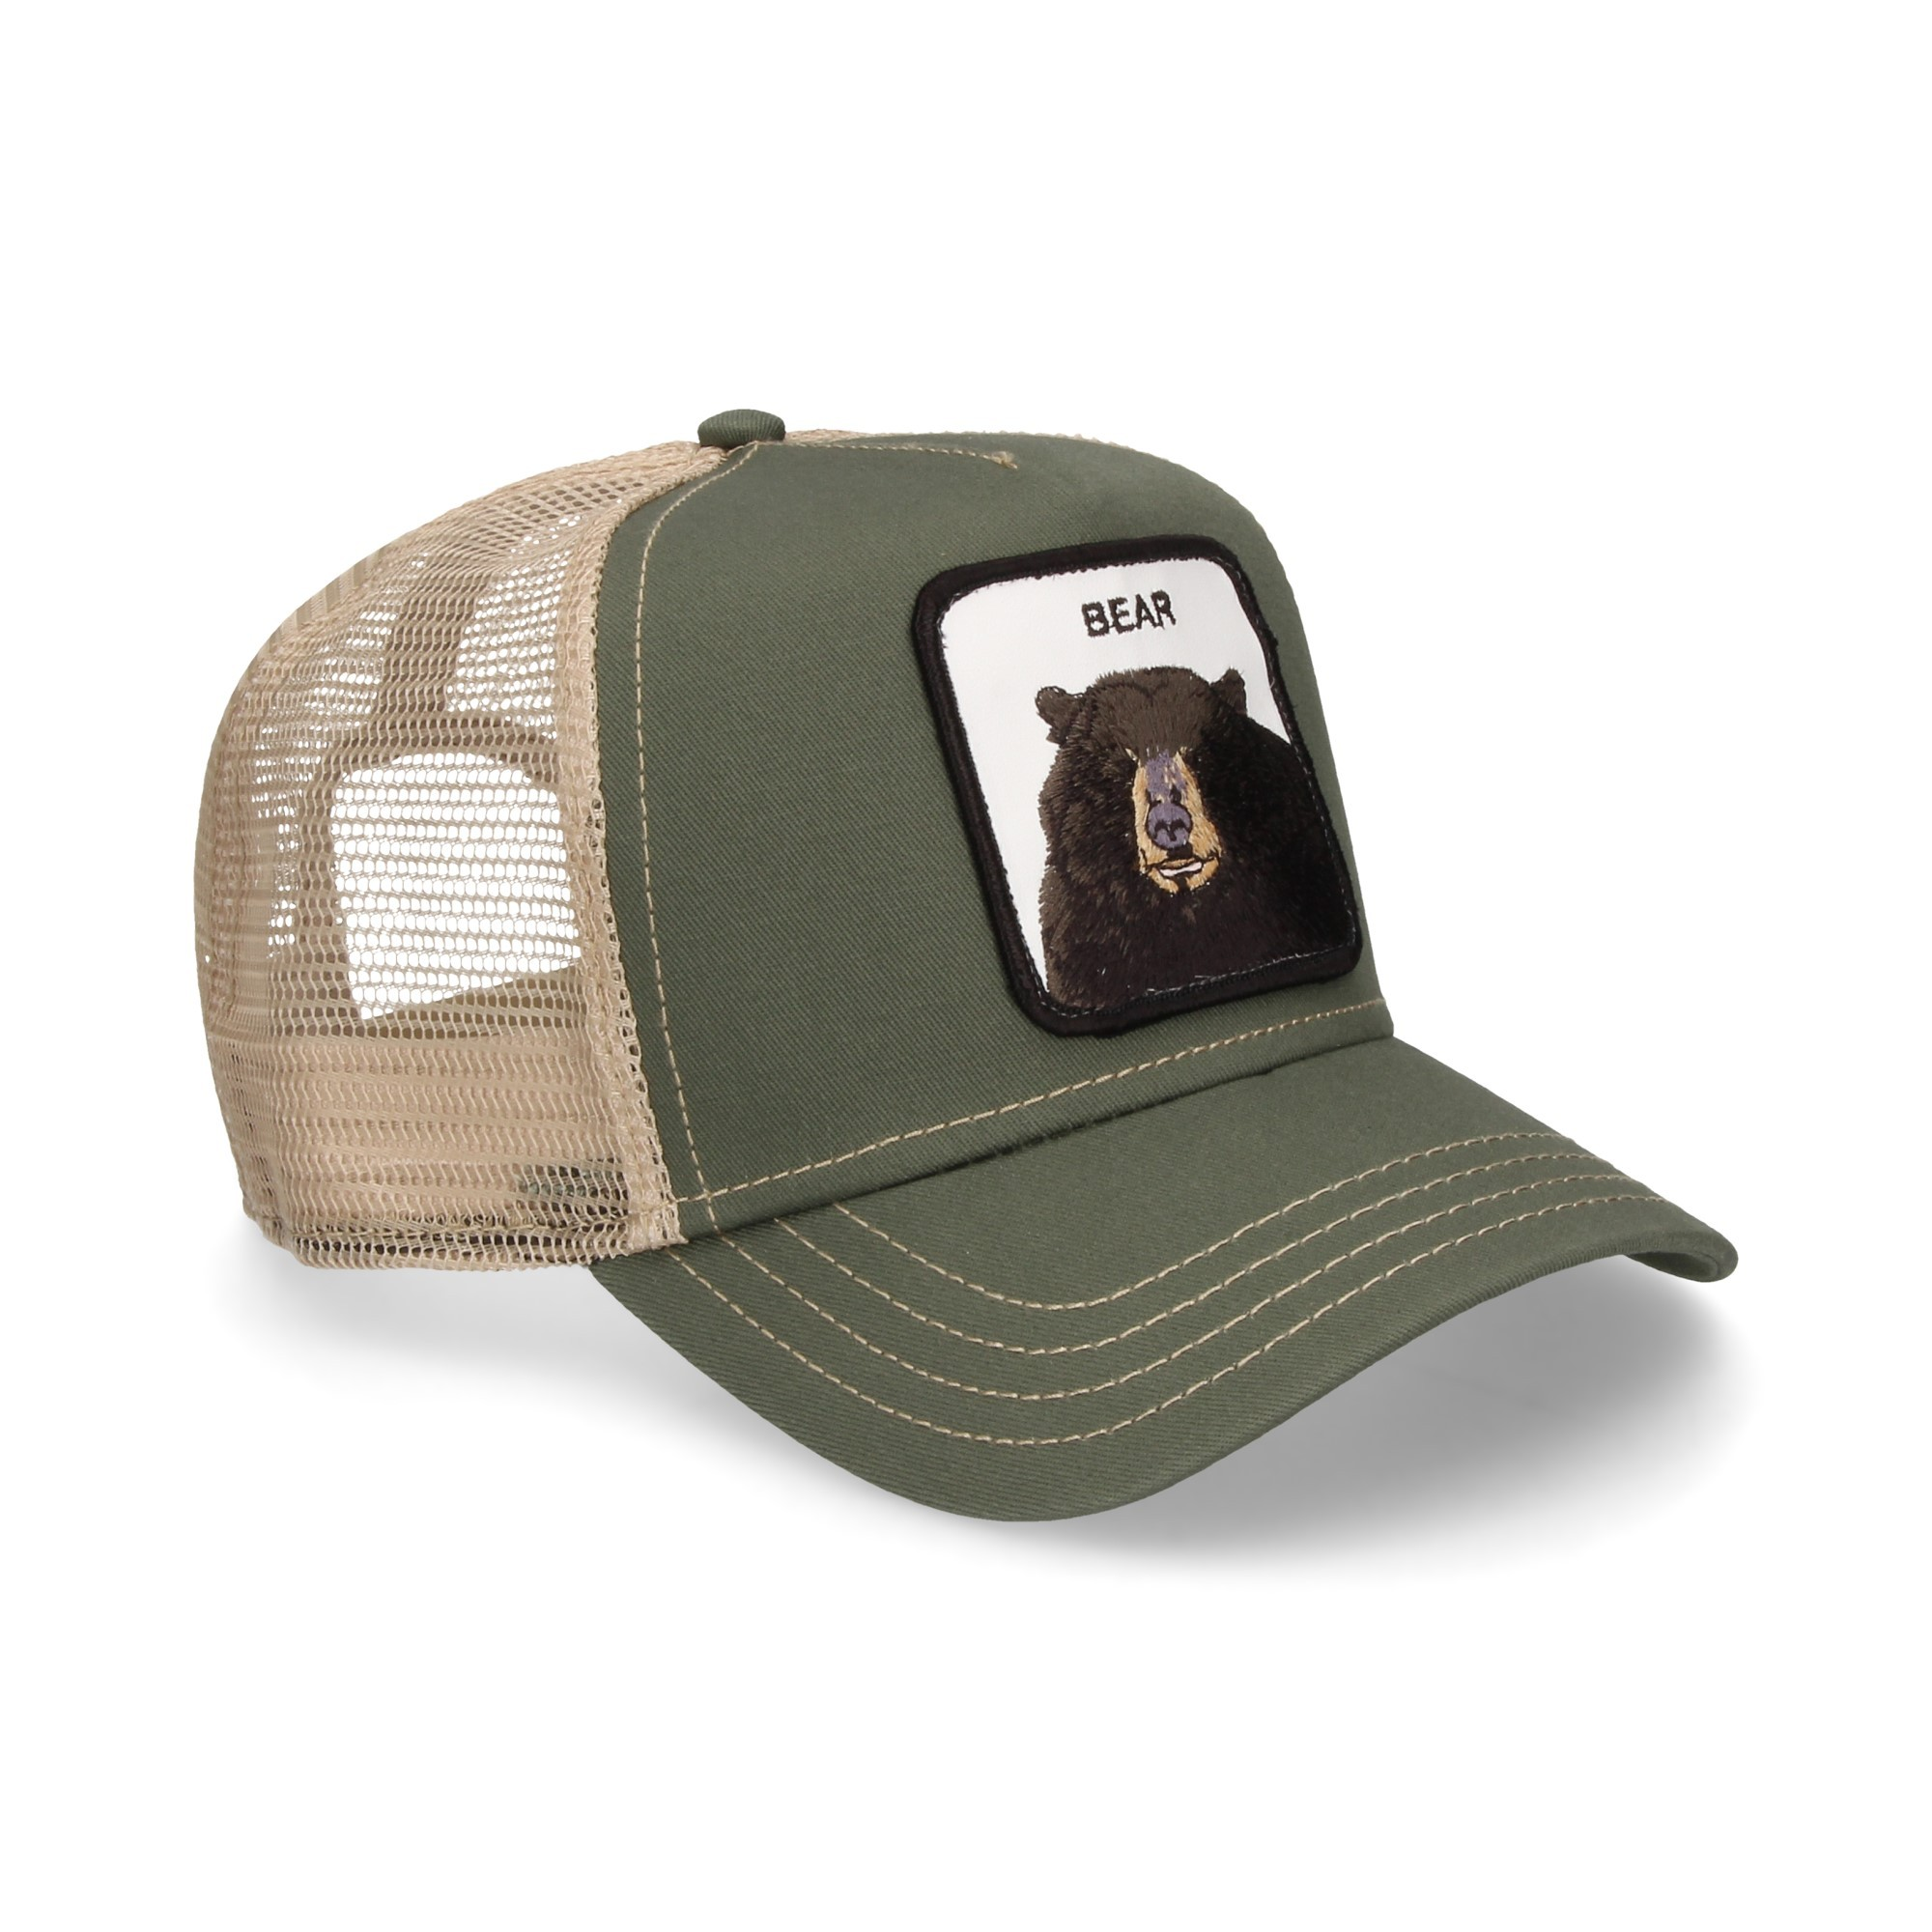 d8f2c9f09 GOORIN BROS Caps and visors 101-0254 OLI OLIVE